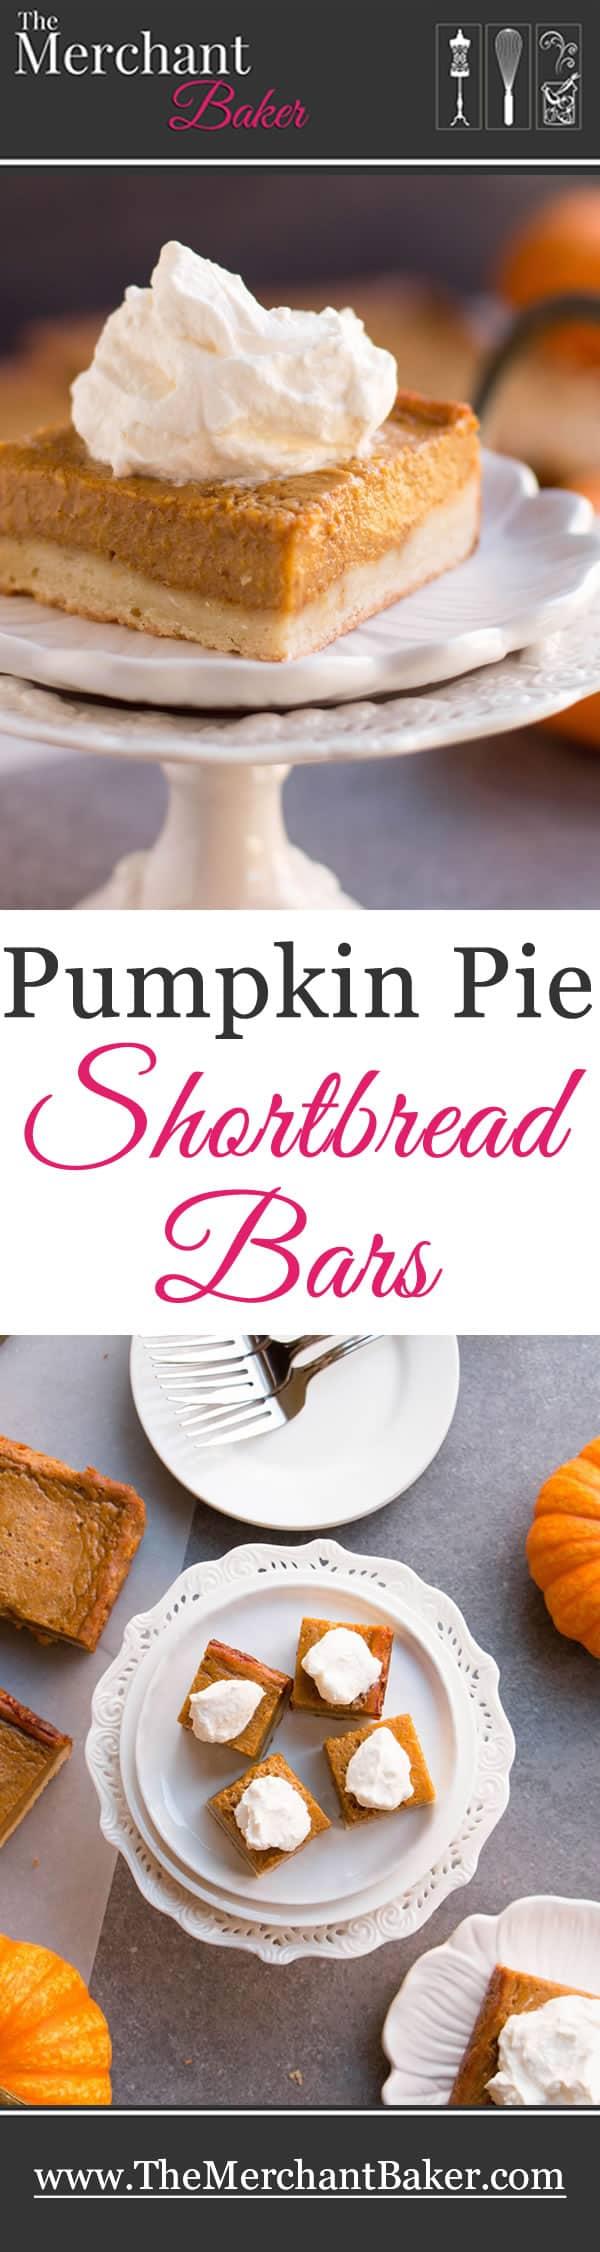 pumpkin-pie-shortbread-bars